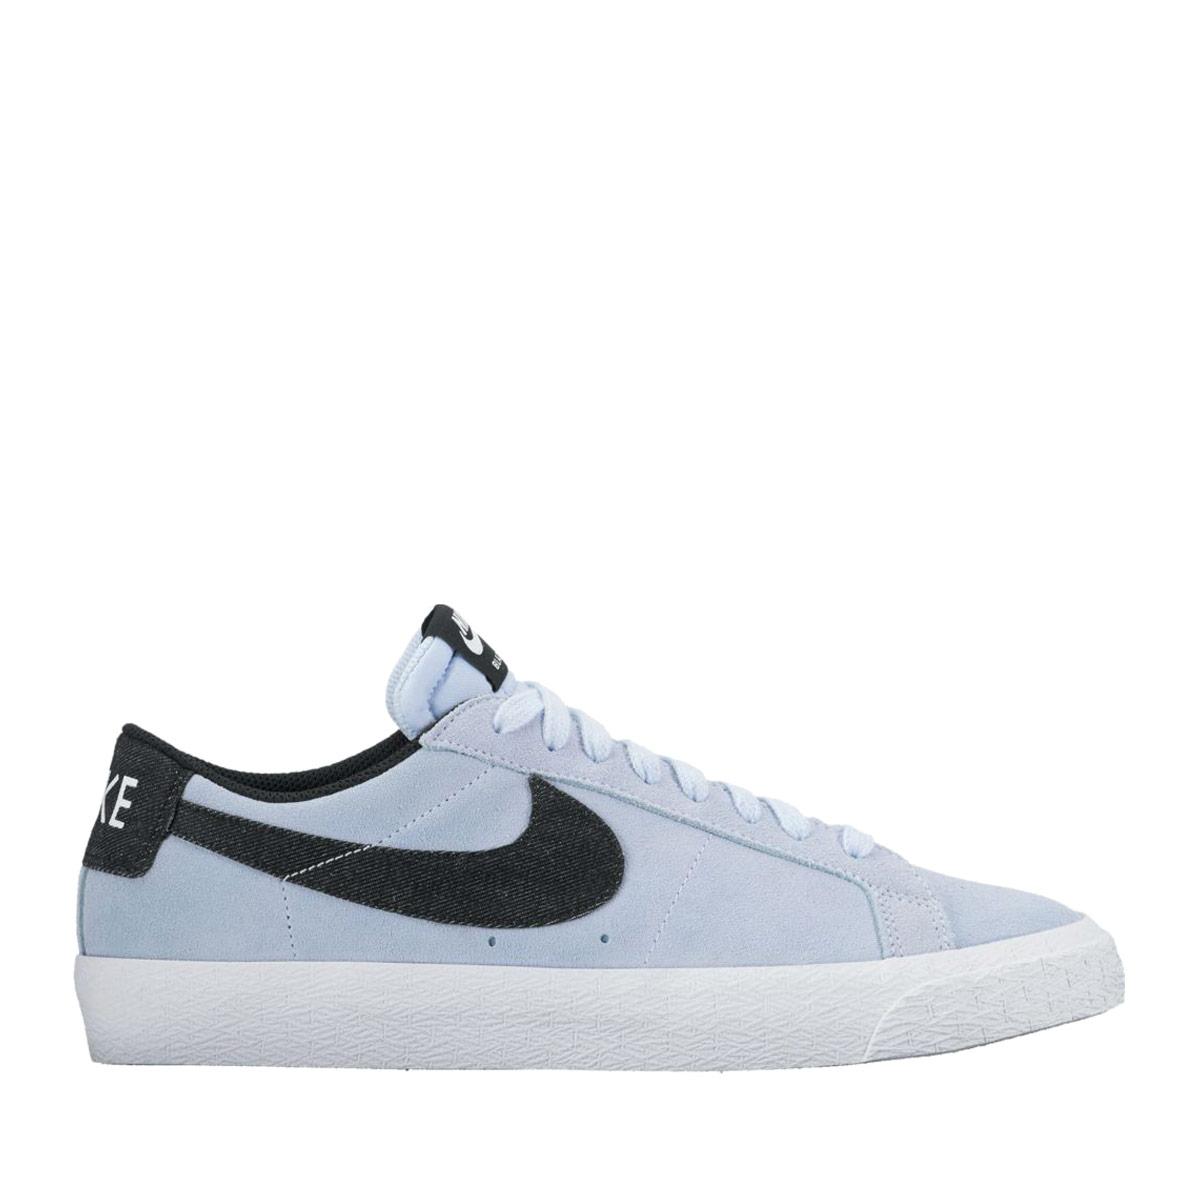 buy popular 6e90d b83f8 NIKE SB ZOOM BLAZER LOW (Nike Nike SB ズームブレーザーロー) HYDROGEN BLUE/BLACK-WHITE  17FA-I